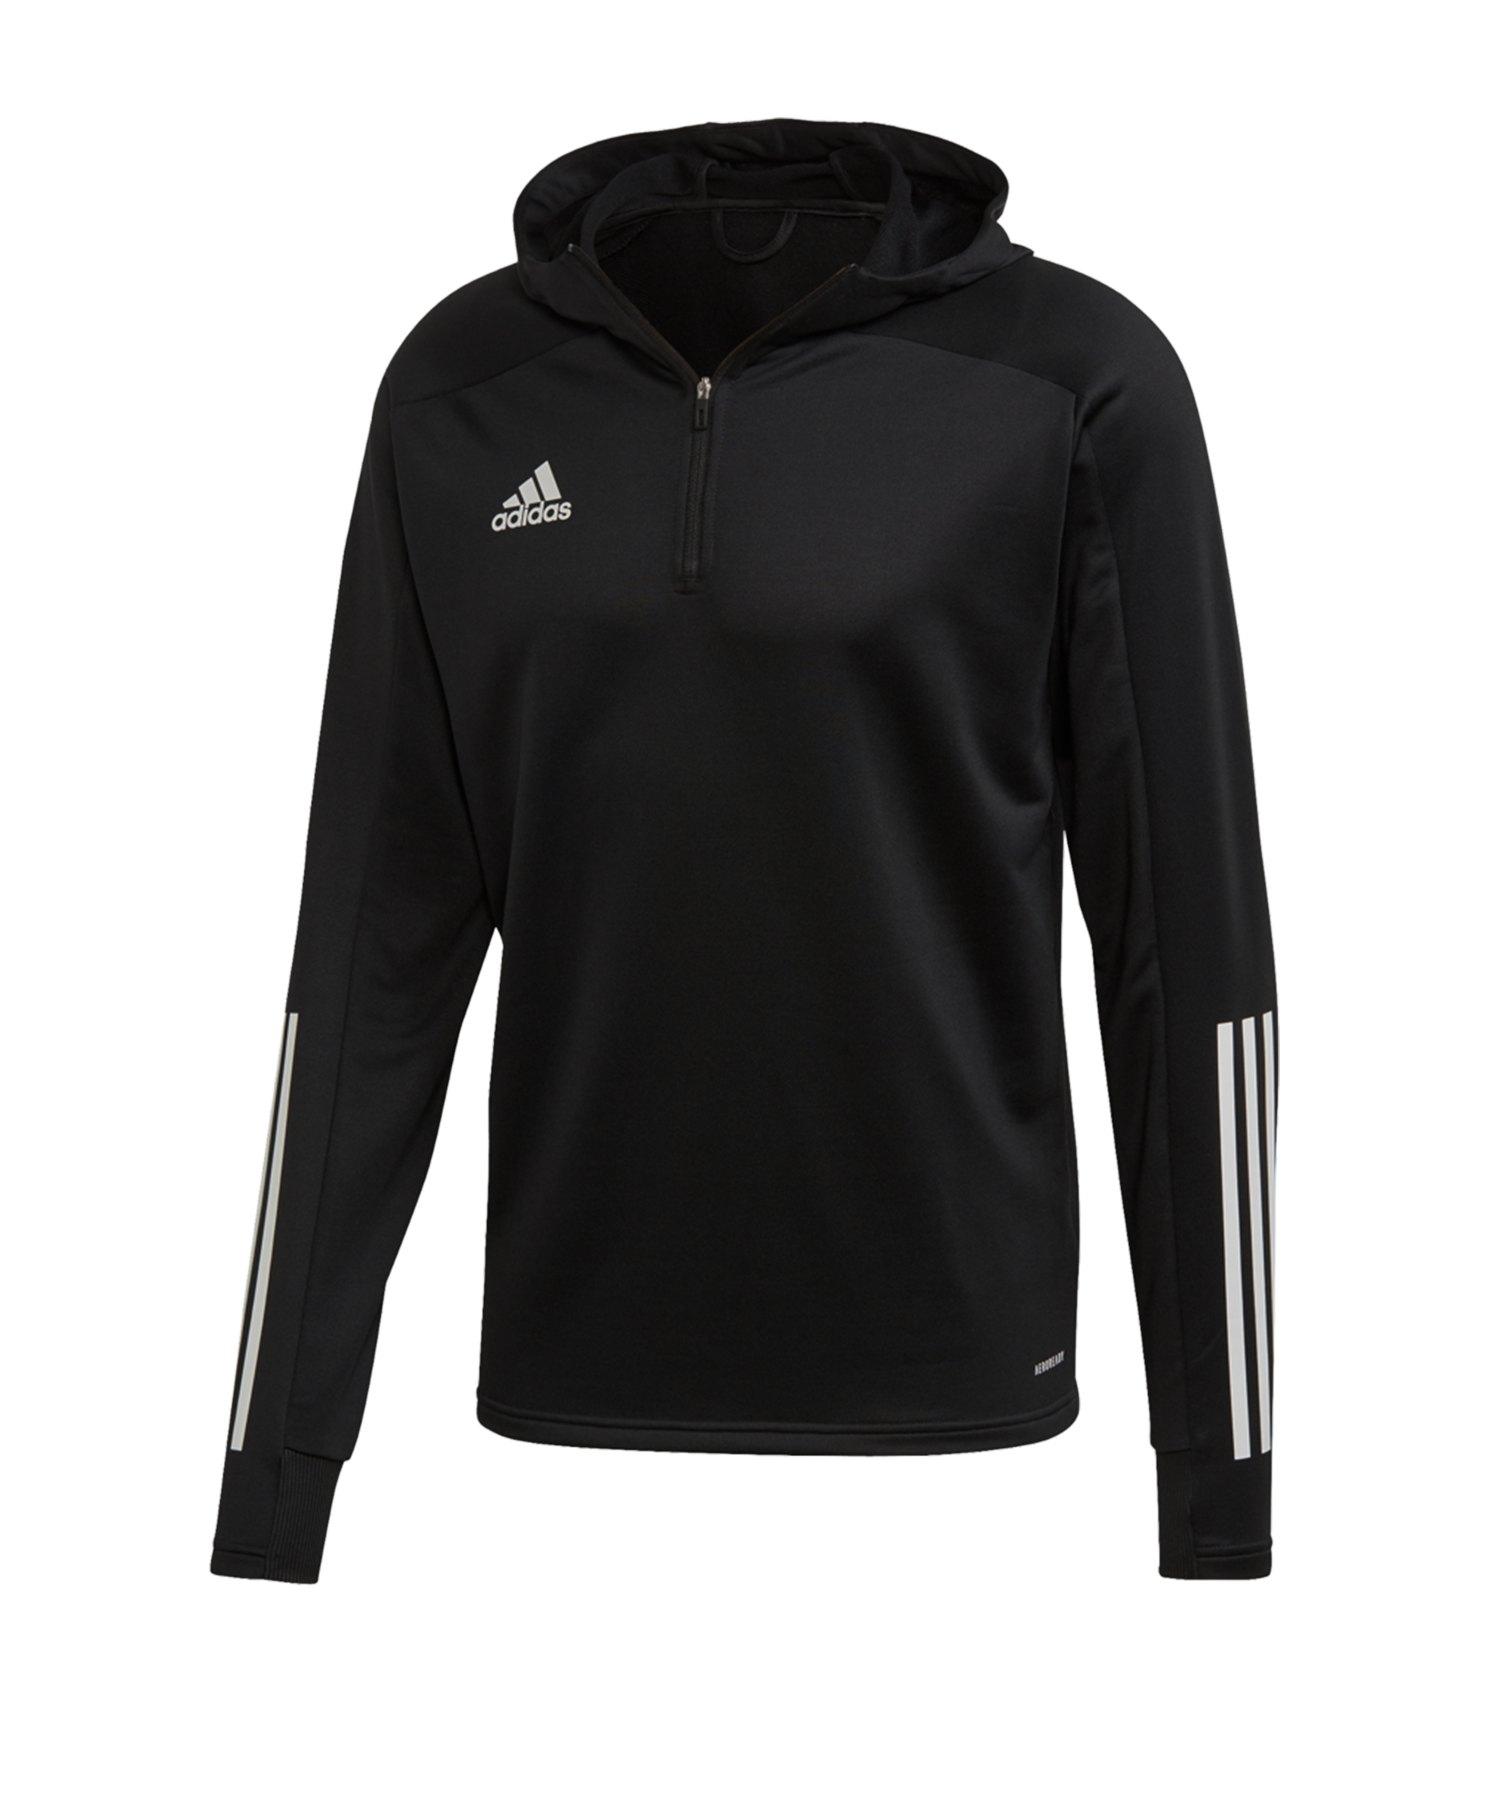 adidas Condivo 20 Kapuzensweatshirt Schwarz - schwarz